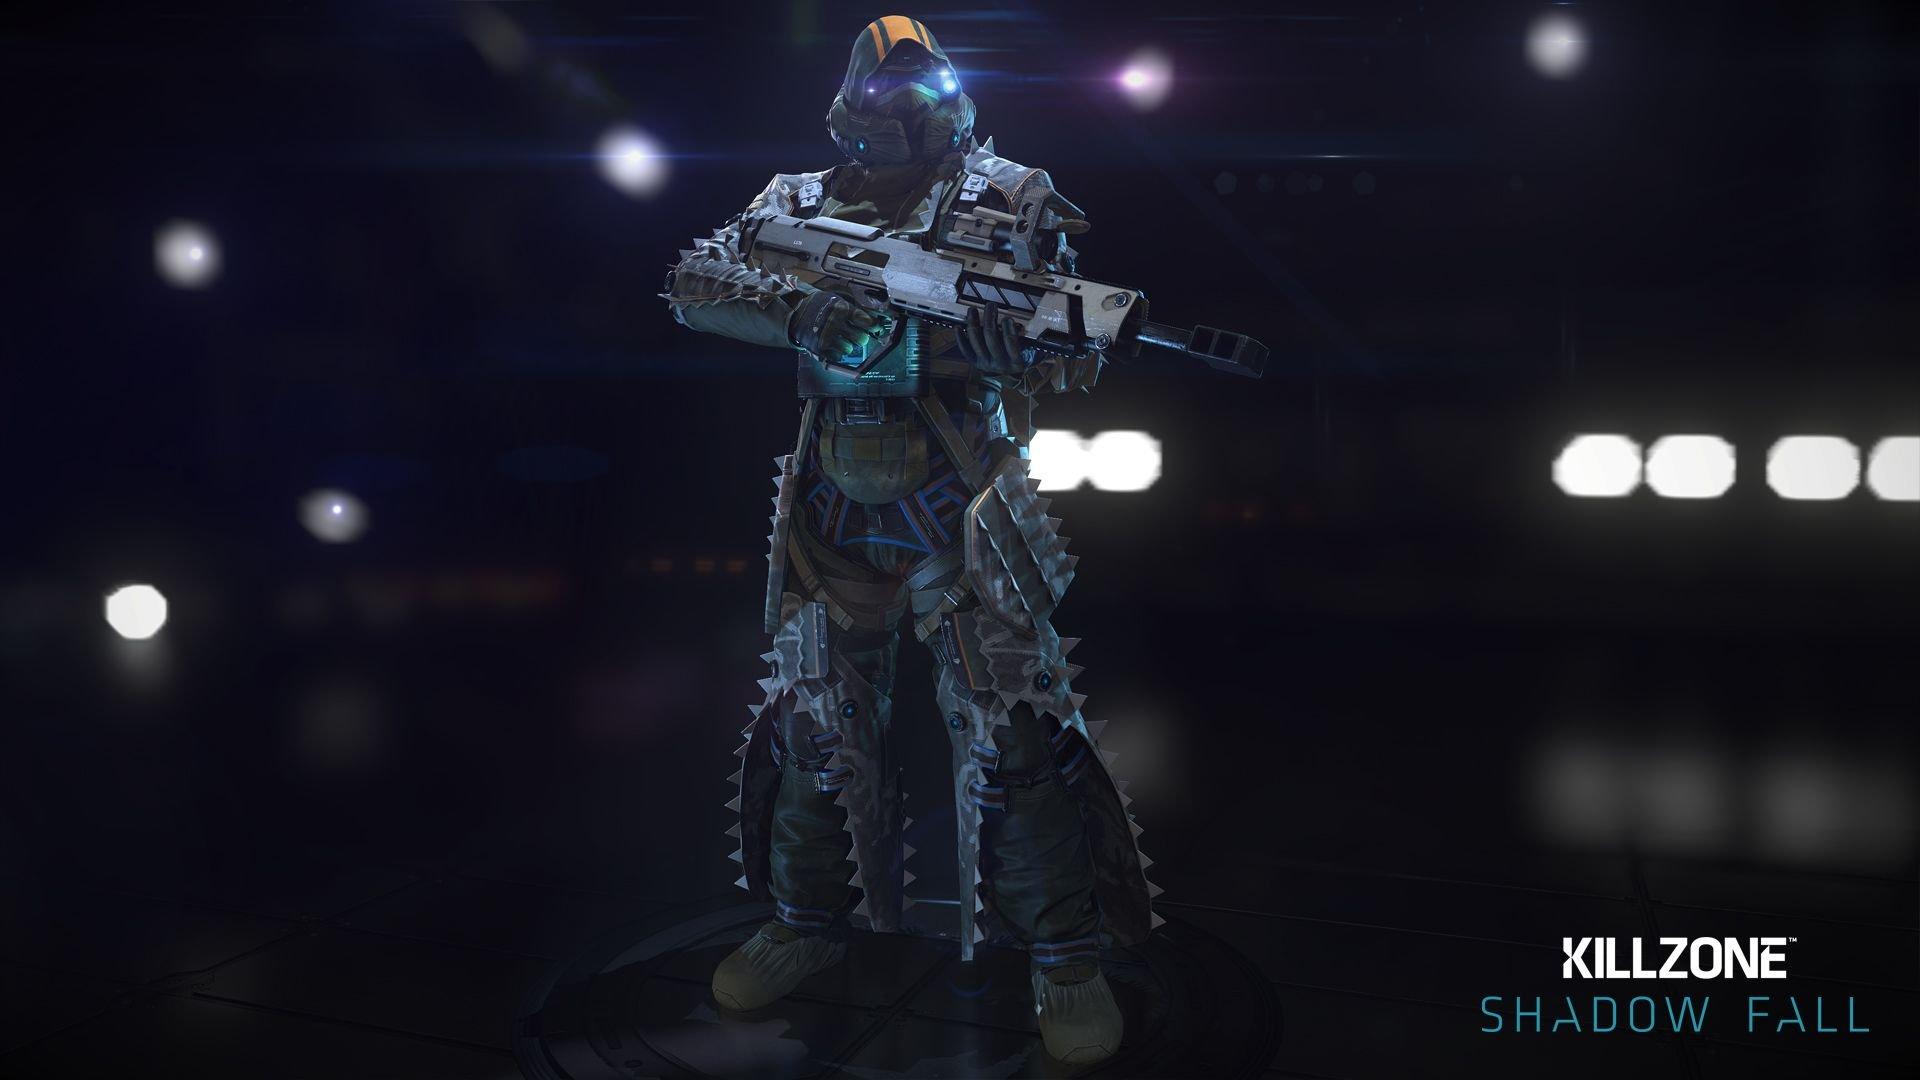 Killzone-ShadowFall PS4 Editeur 042